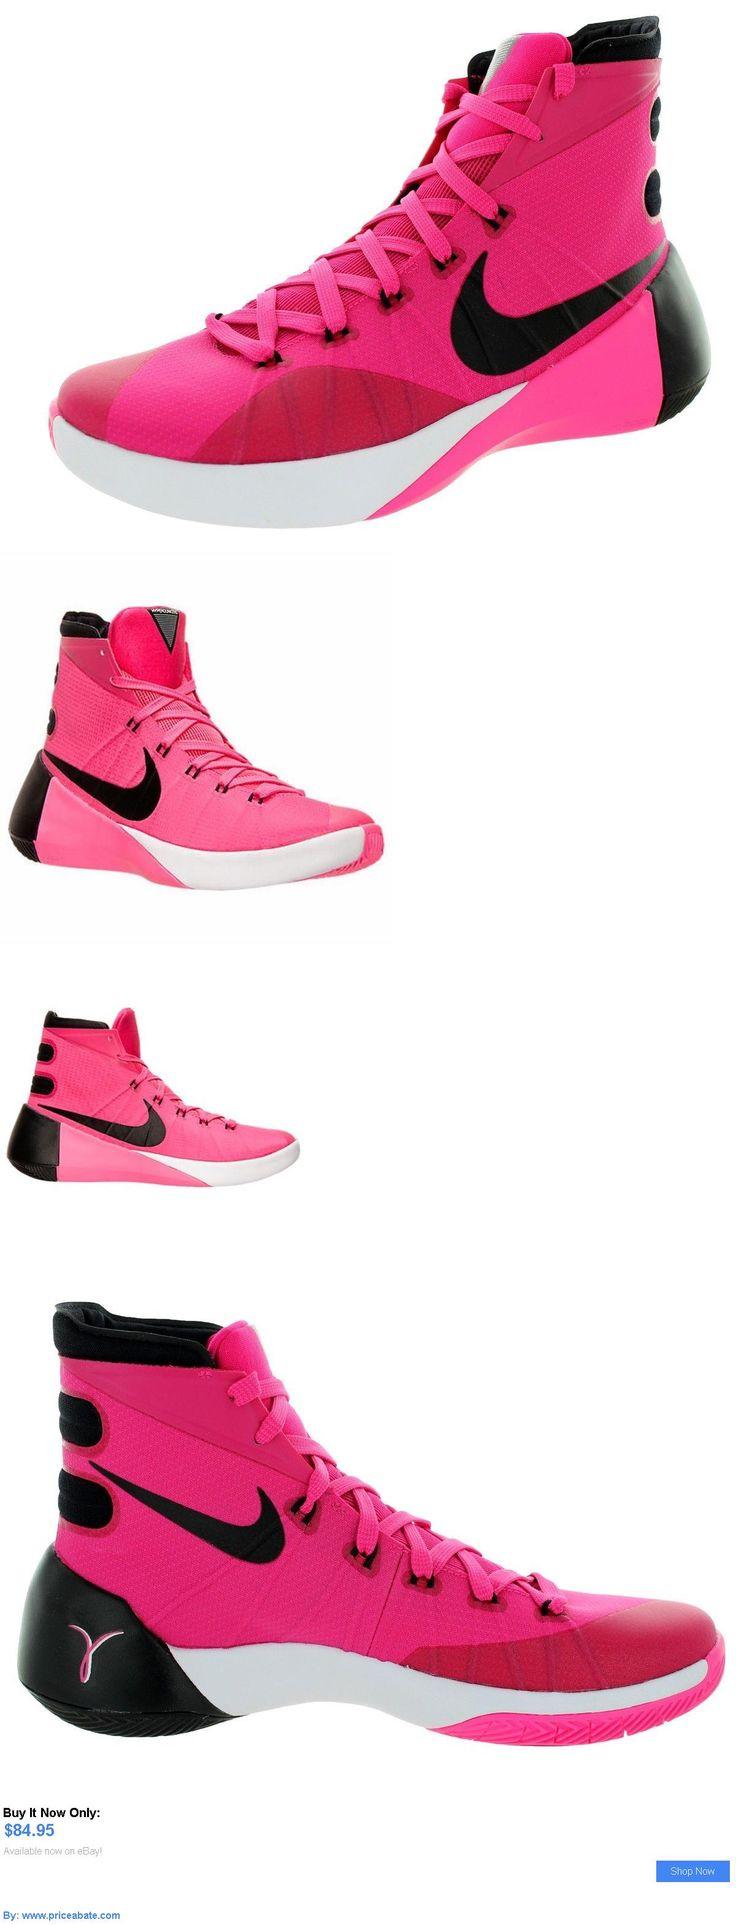 Basketball: Nike Mens Hyperdunk 2015 Basketball Shoes 749561 606 Pink/Black/White BUY IT NOW ONLY: $84.95 #priceabateBasketball OR #priceabate